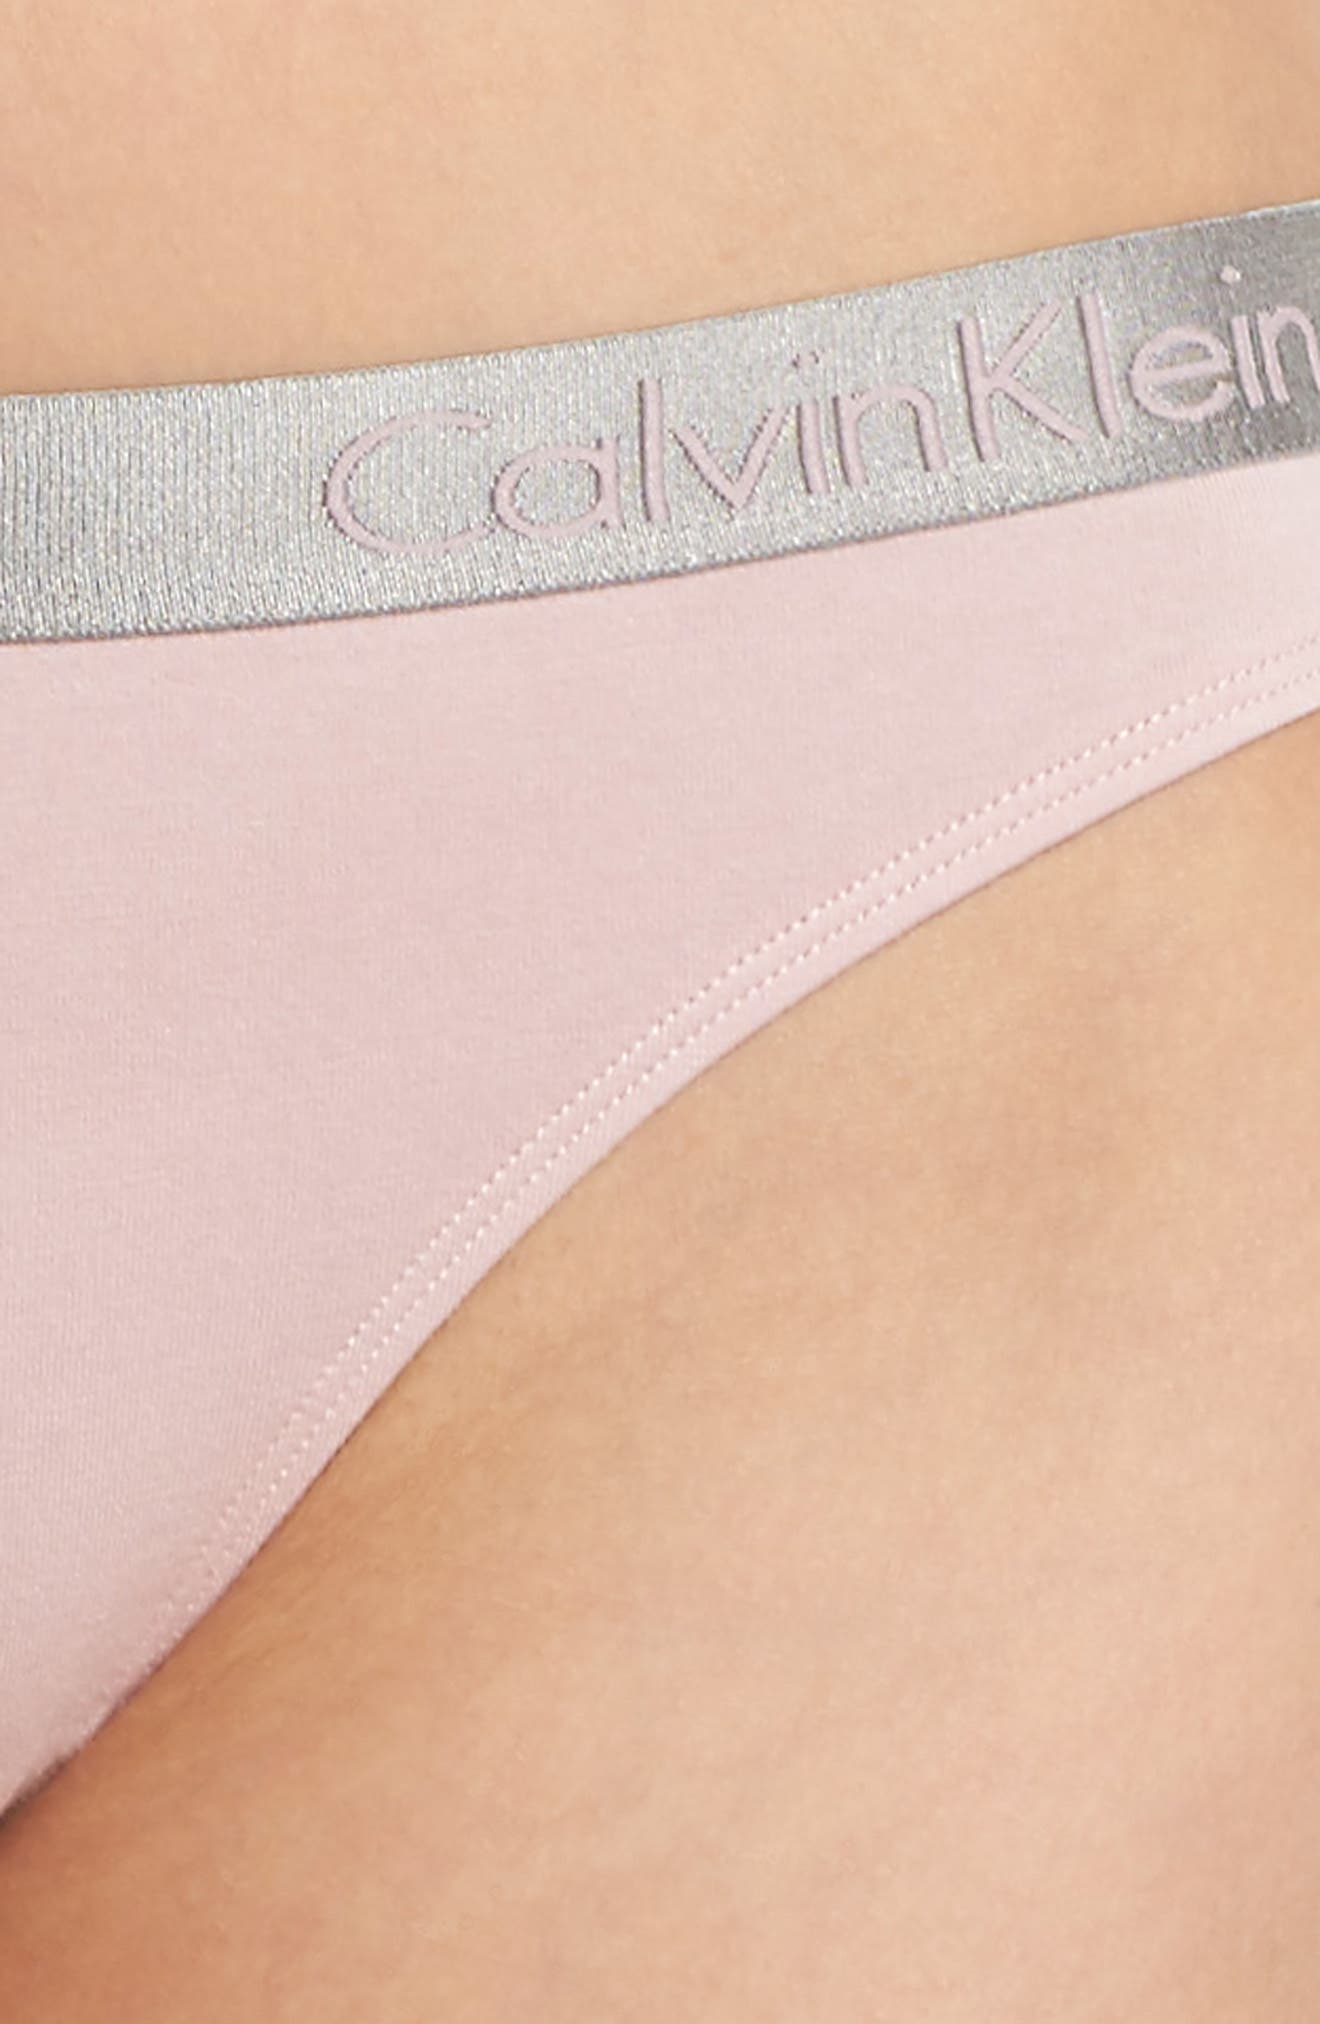 'Radiant' Cotton Thong,                             Alternate thumbnail 80, color,